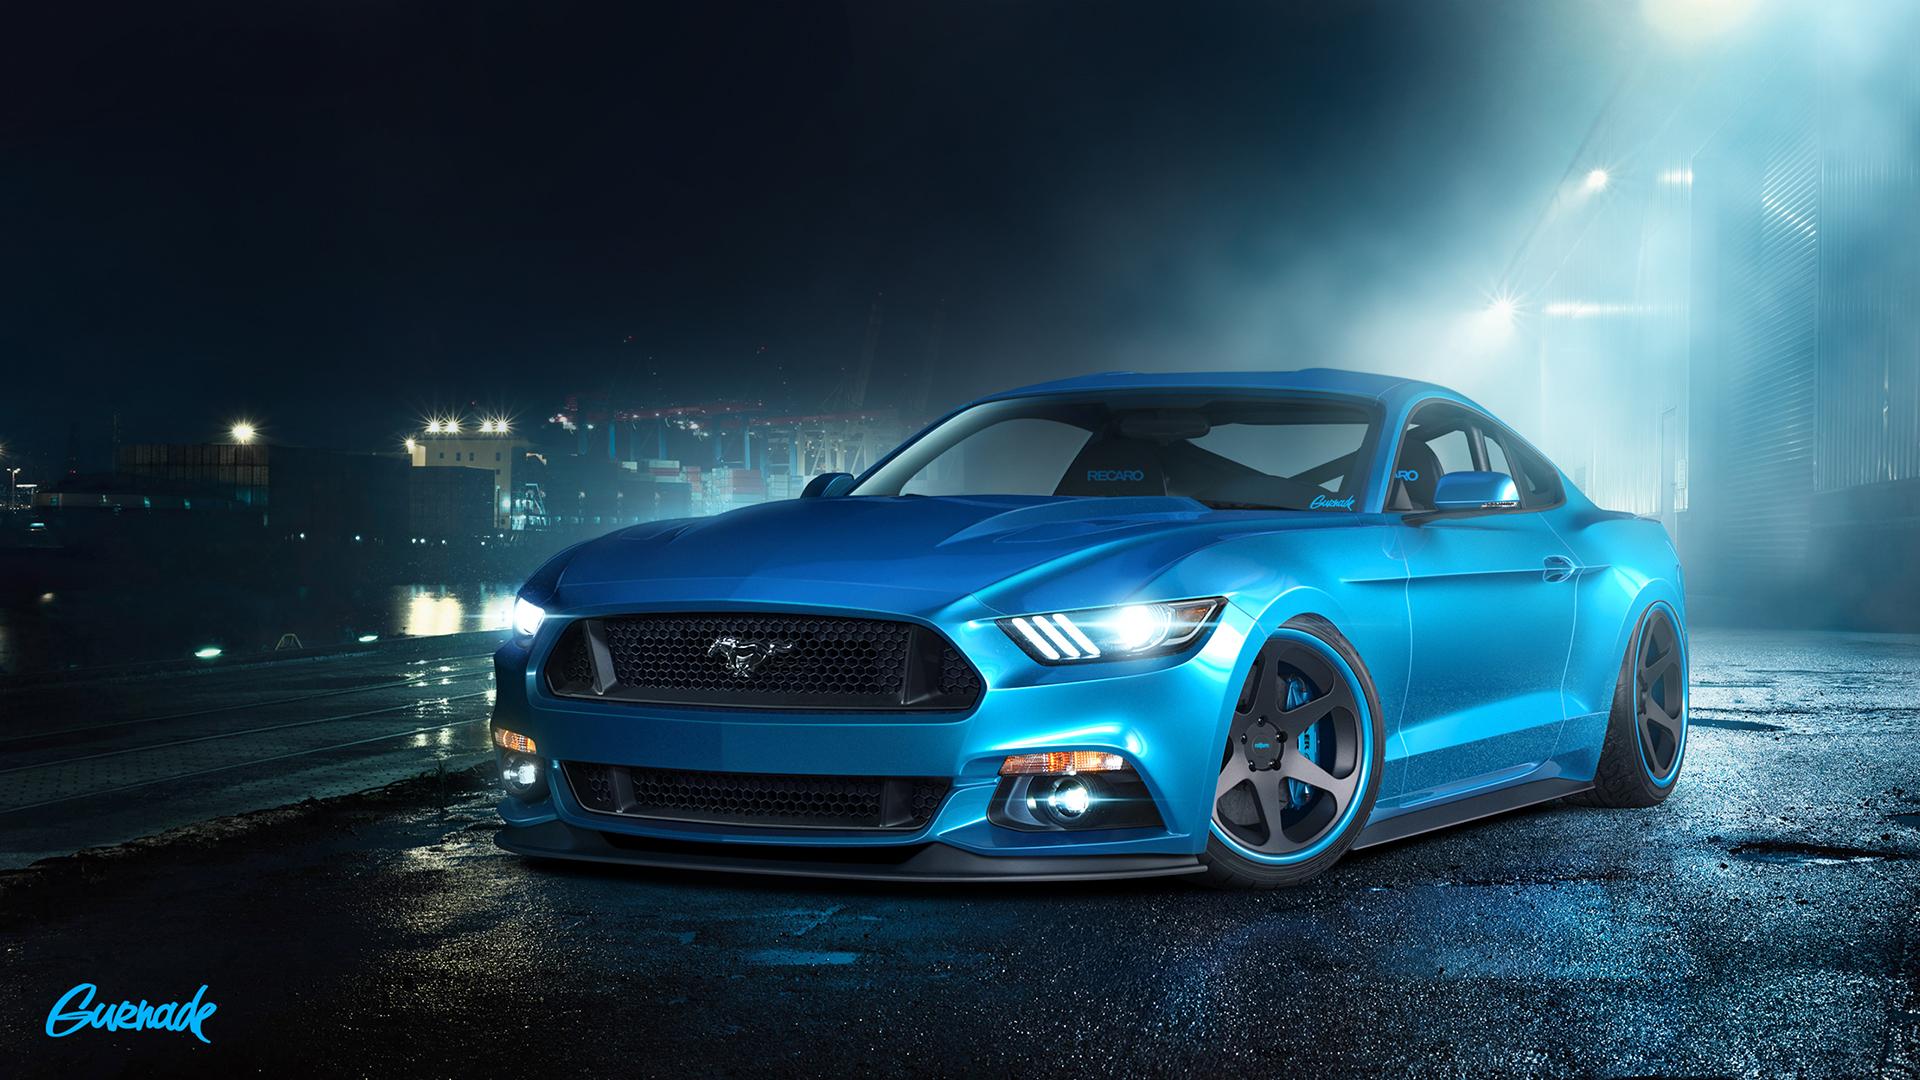 2015 Ford Mustang GT Wallpaper HD